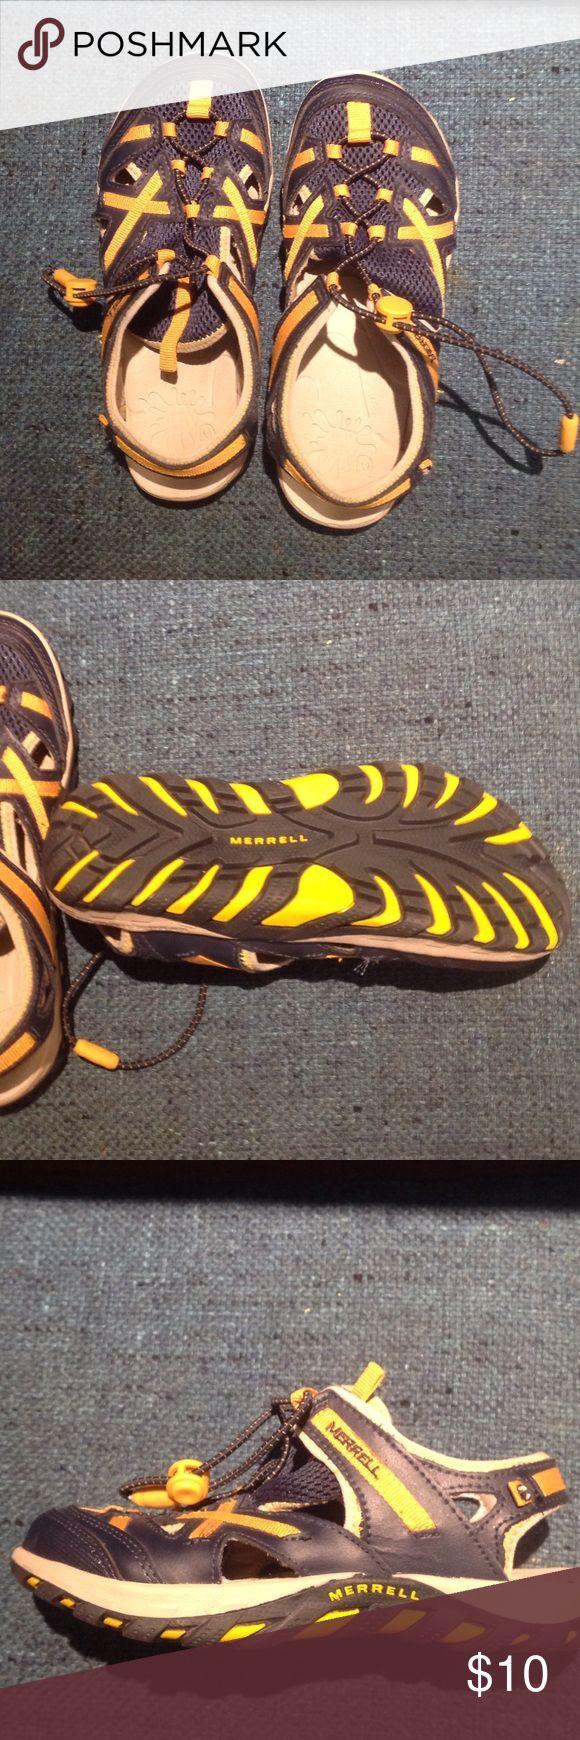 Merrill Boy's Waterpro Shoes Worn once - Waterpro Skip Kids great for beach shoes or lake.  Non-marking sole - built to get wet. Navy/yellow Waterpro Skip Kids Merrill Shoes Water Shoes